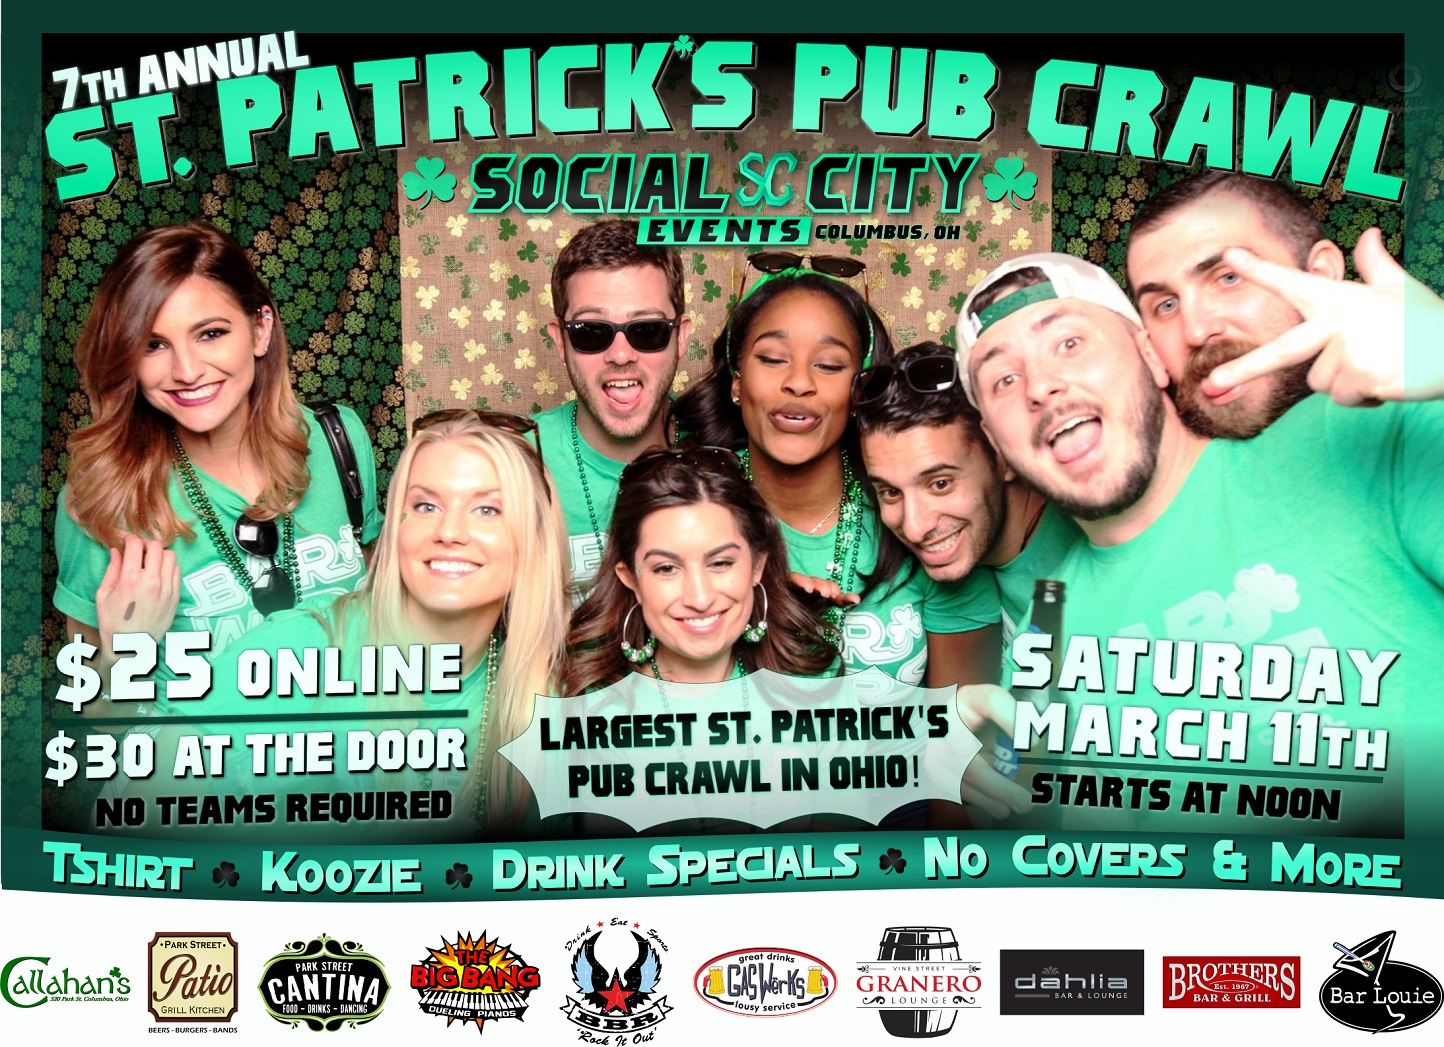 Social City Events 7th Annual St. Patrick's Pub Crawl